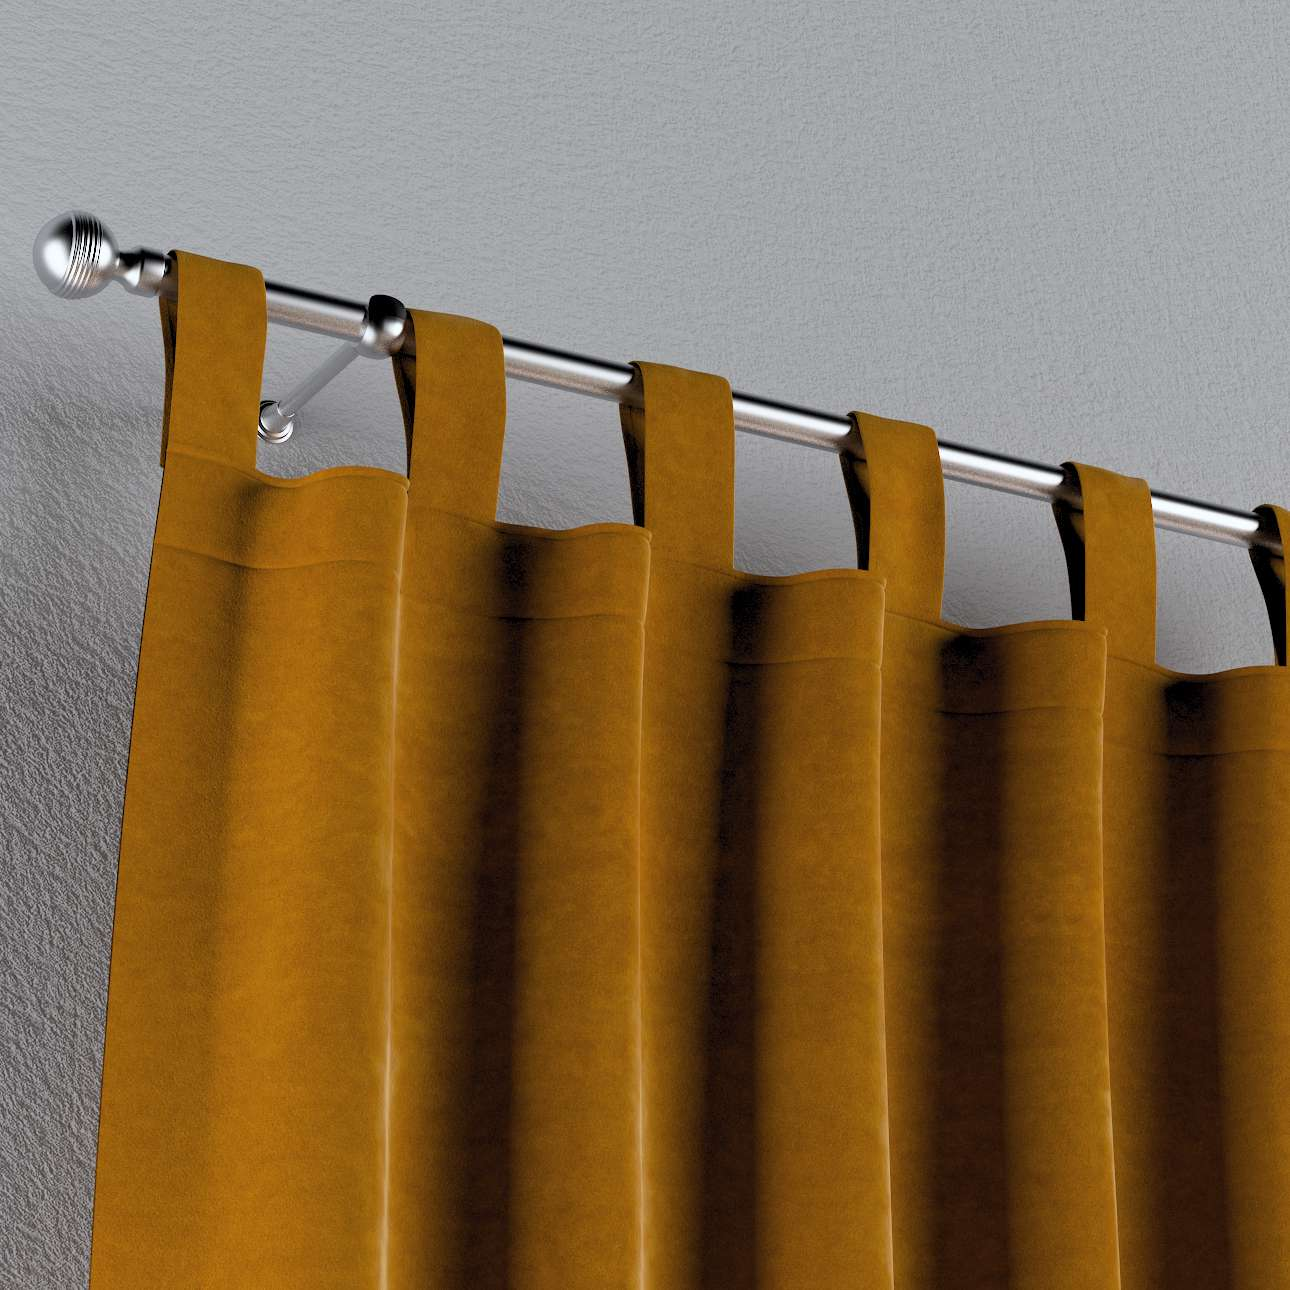 Záves na pútkach V kolekcii Velvet, tkanina: 704-23